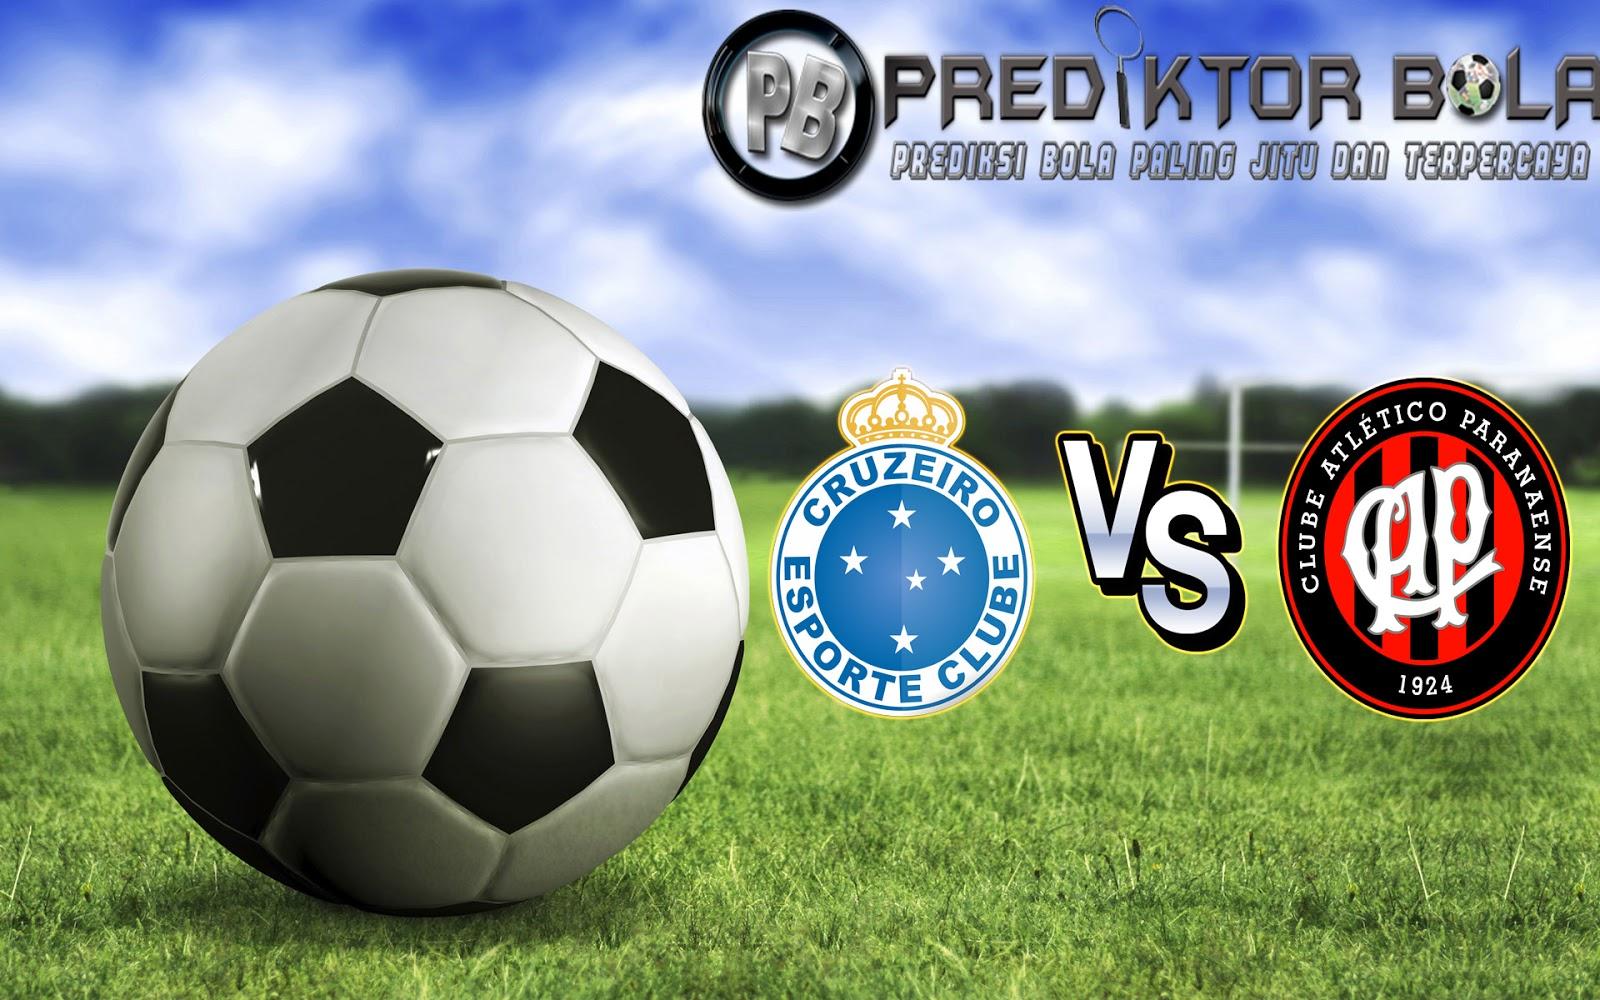 Prediksi Cruzeiro vs Atletico Paranaense 12 Juli 2016